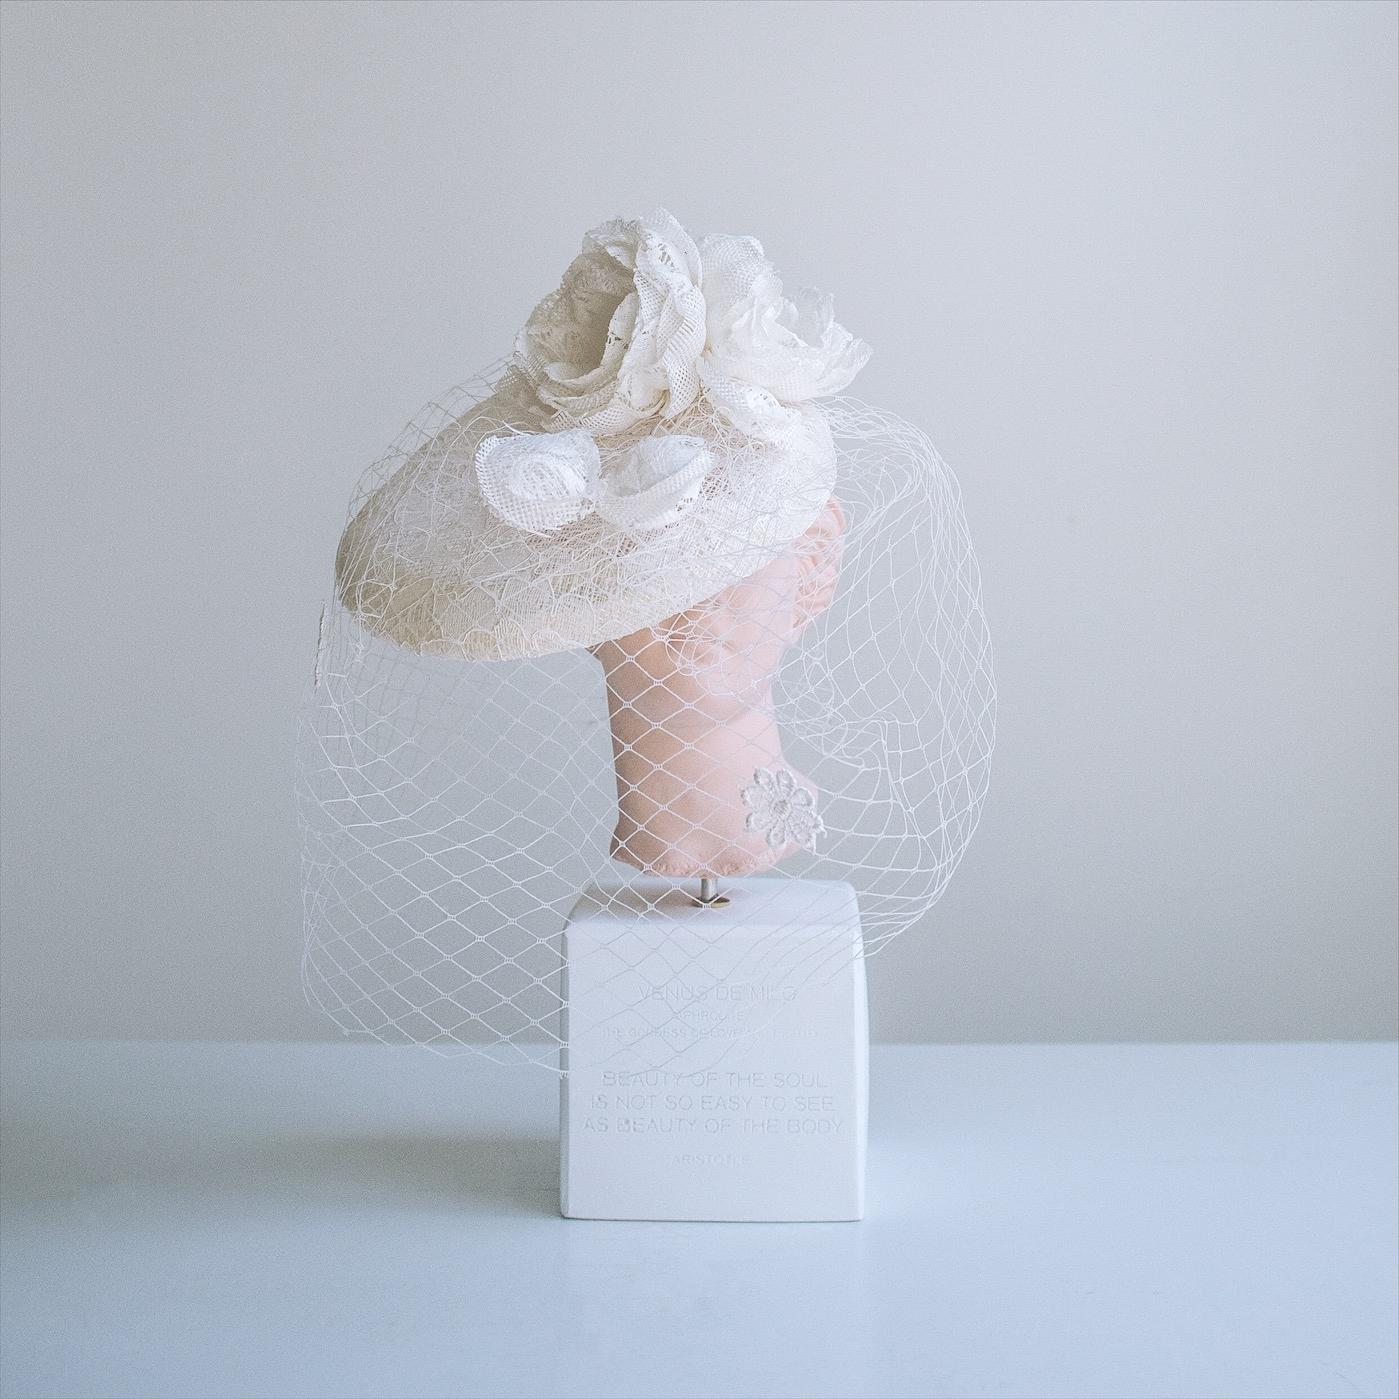 DREAMER оригинал винтаж французский новый Бригада Ньяна шапка ручная работа система